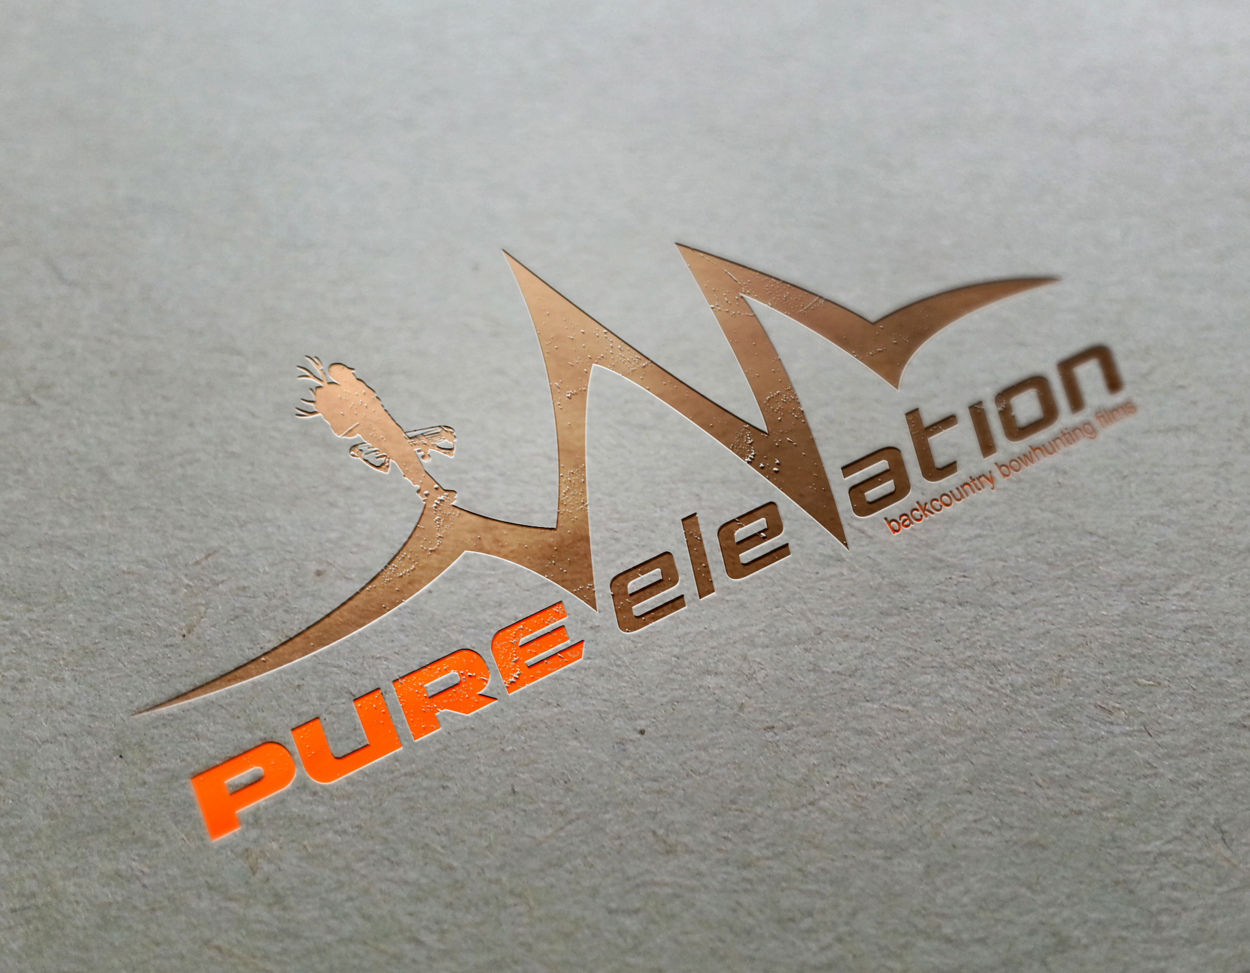 Pure Elevation Productions Outdoor Film Creative Logo Design